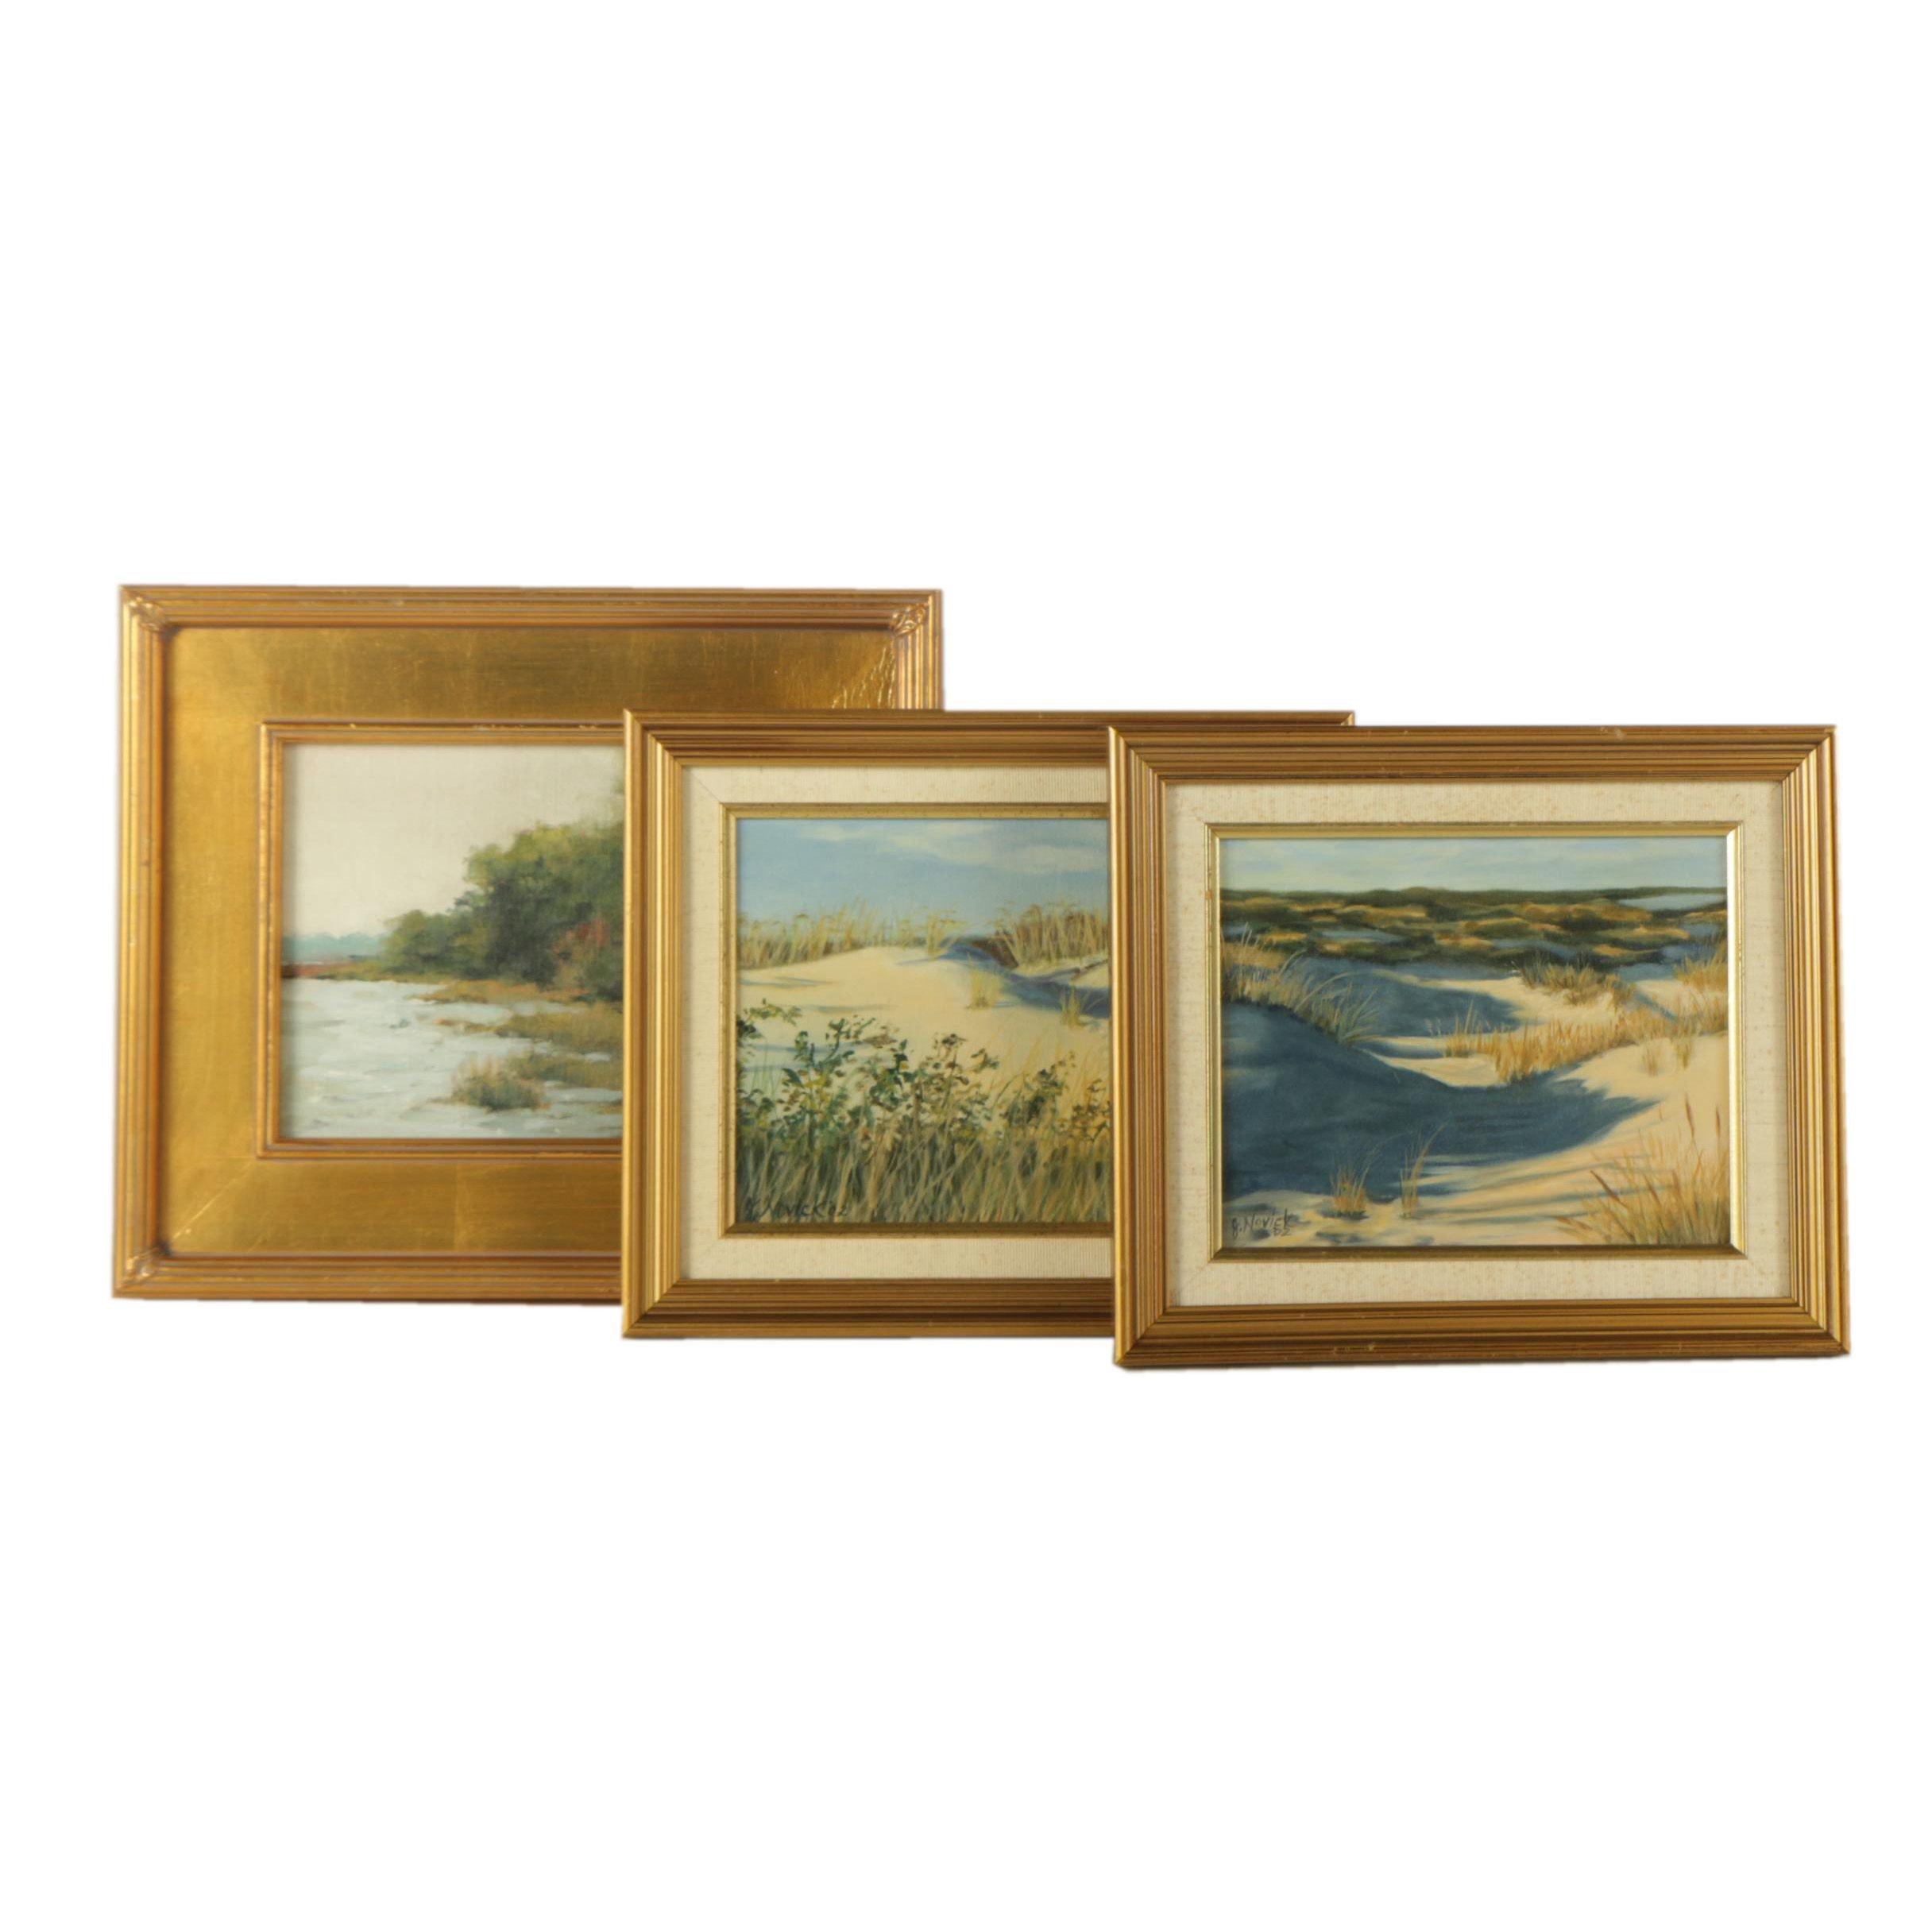 Rose and J. Novick Oil Paintings of Landscape Scenes